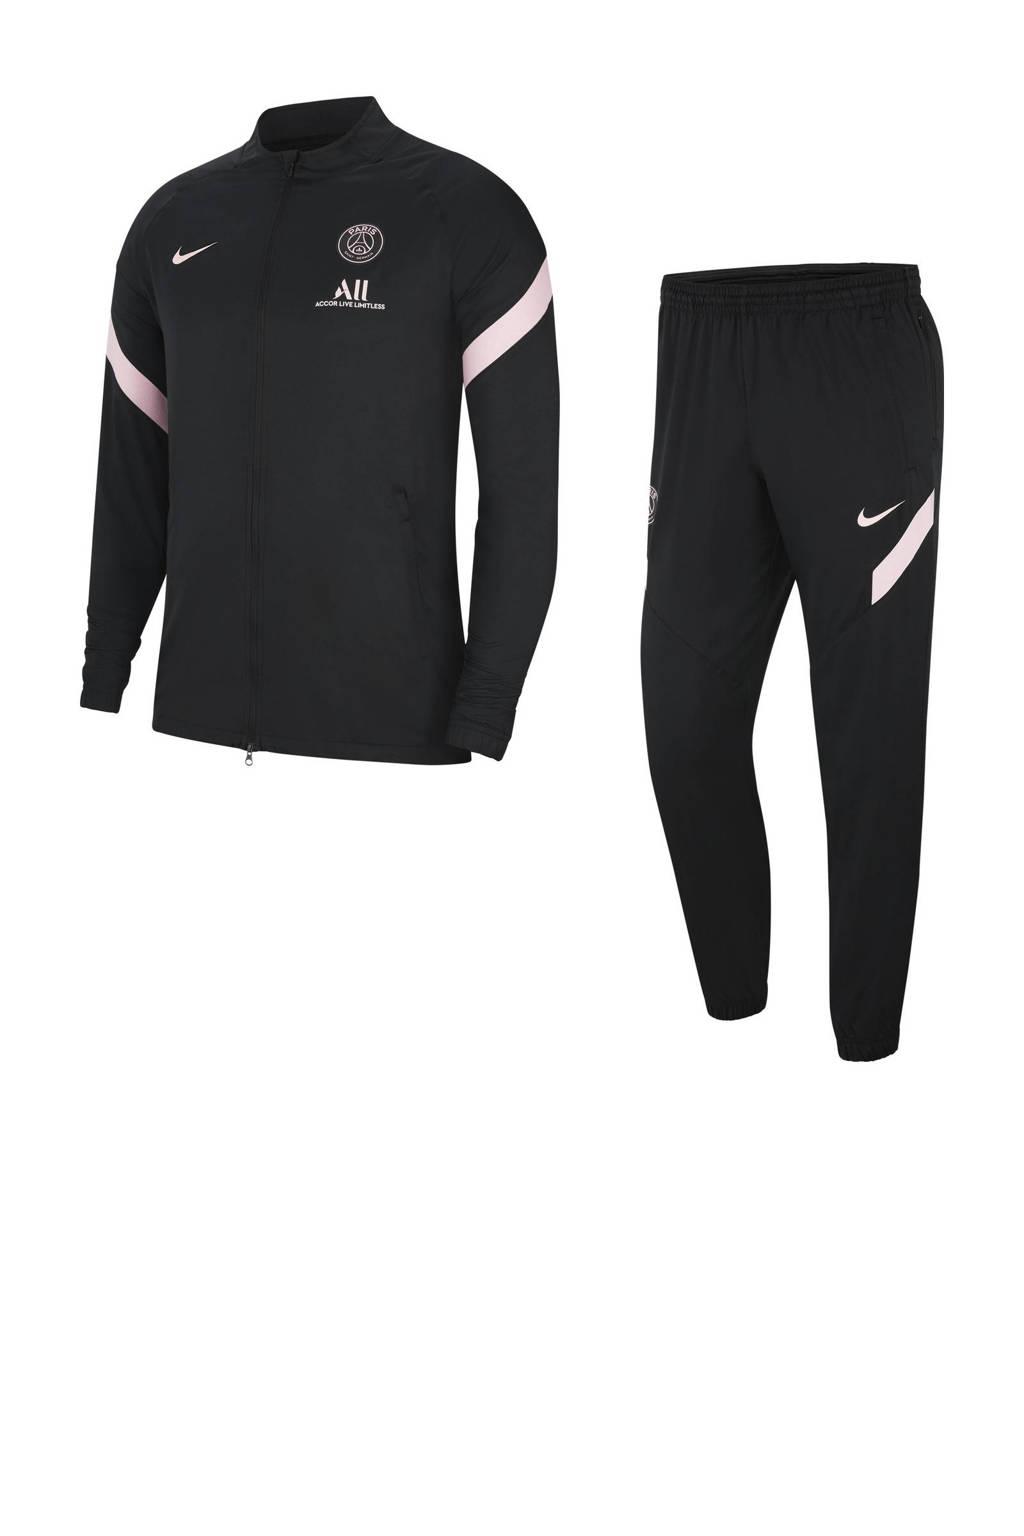 Nike Senior Liverpool FC trainingspak zwart/lichtroze, Zwart/lichtroze